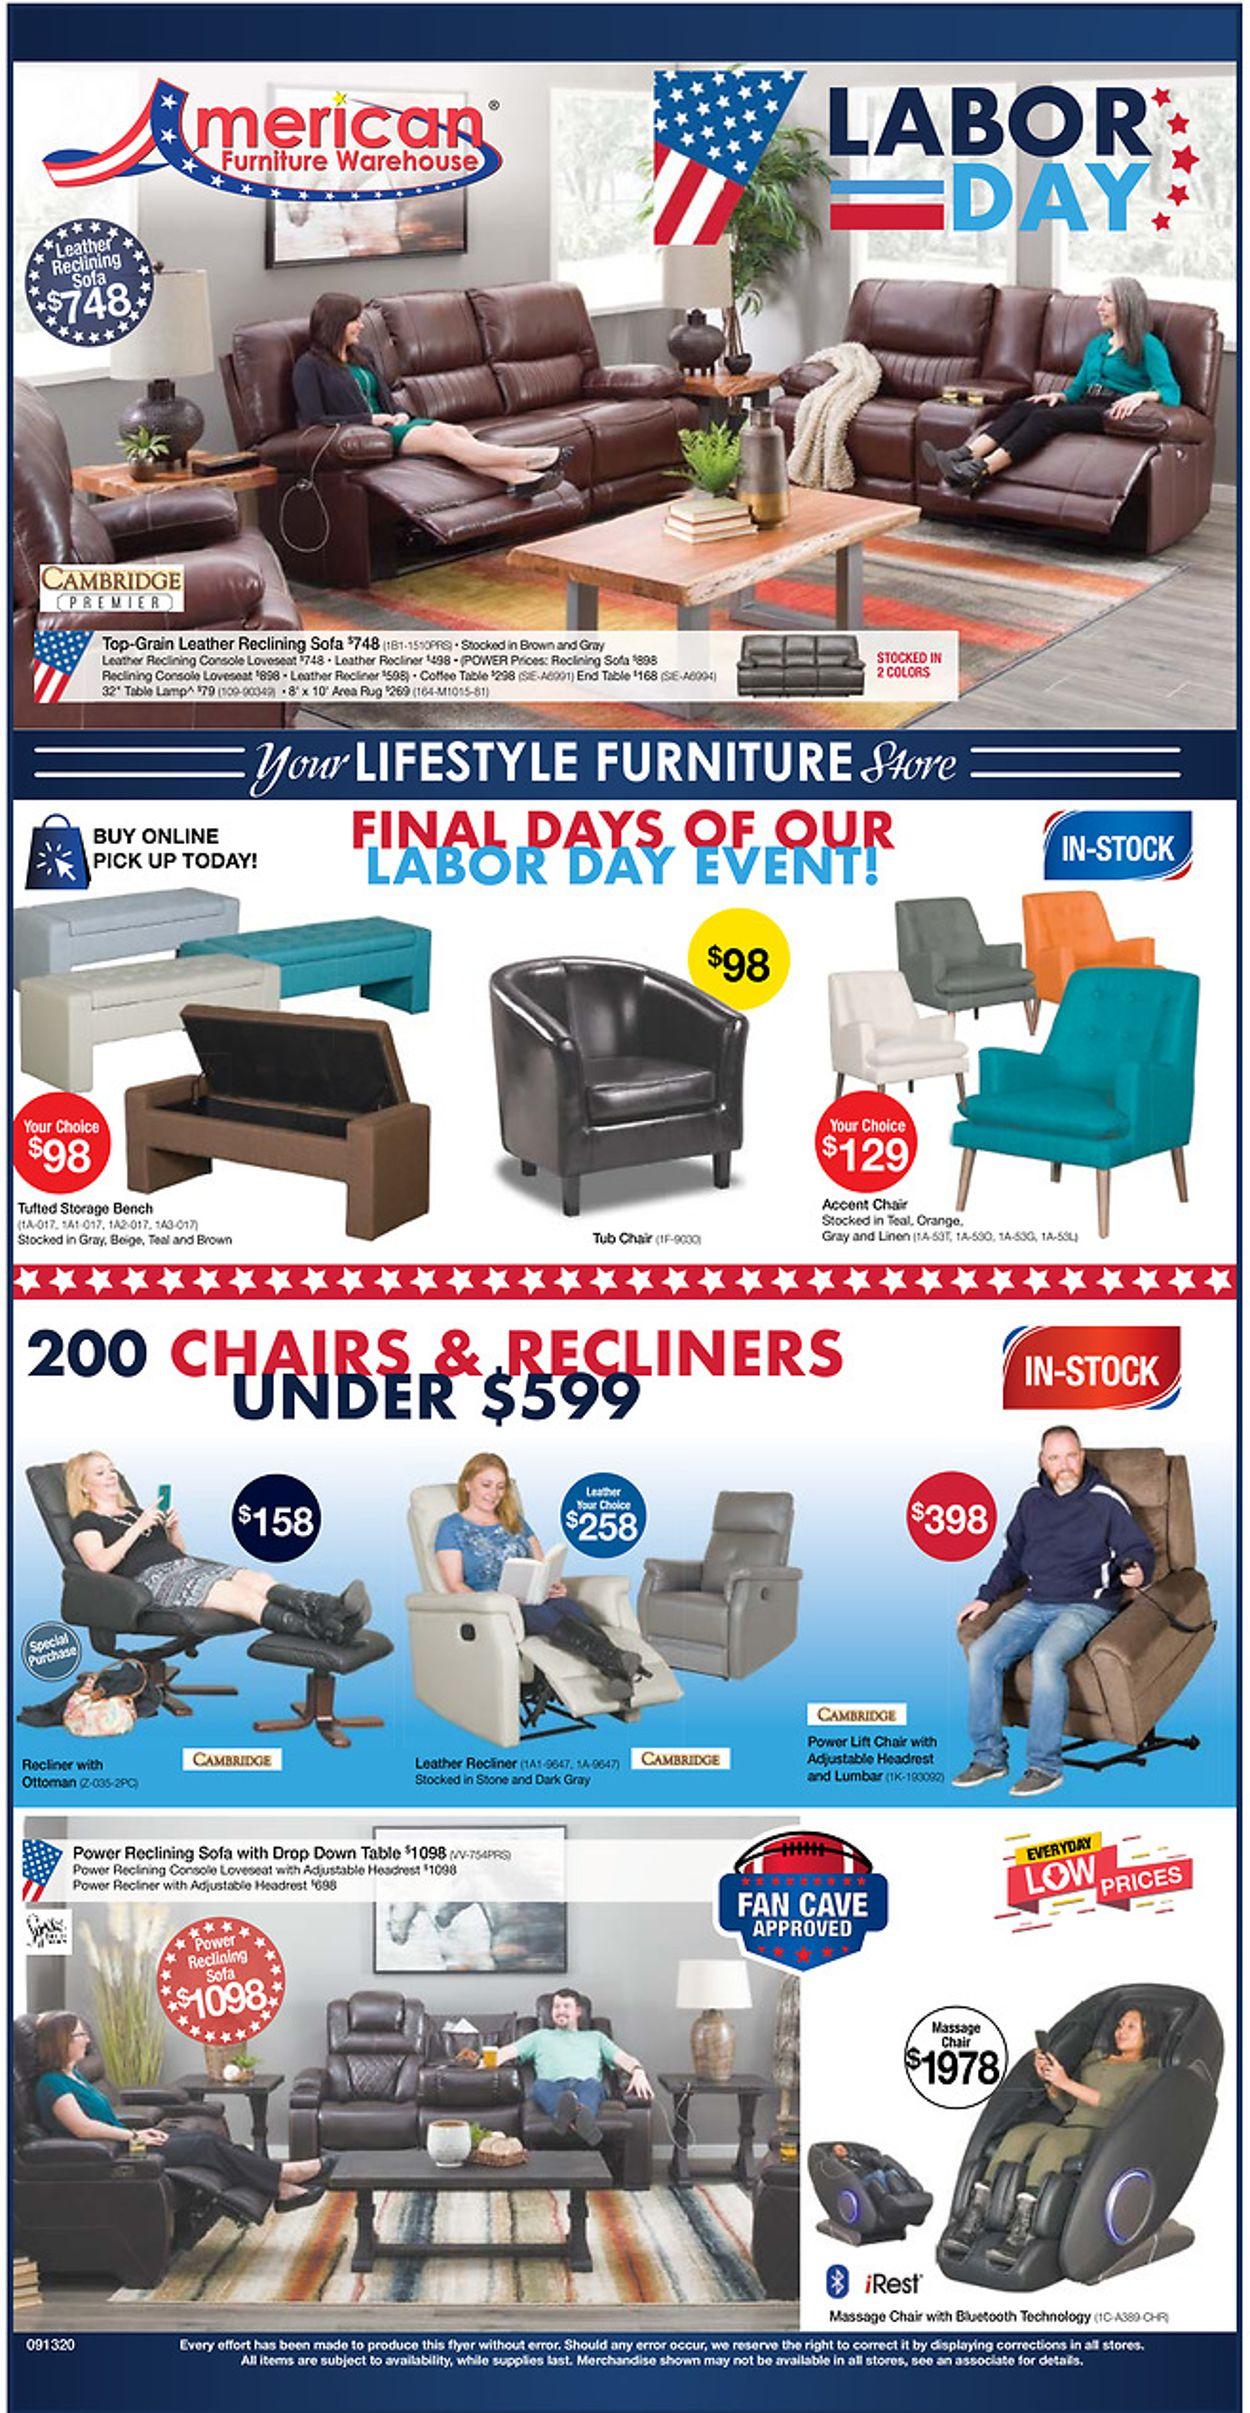 American Furniture Warehouse Weekly Ad Circular - valid 08/19-09/15/2020